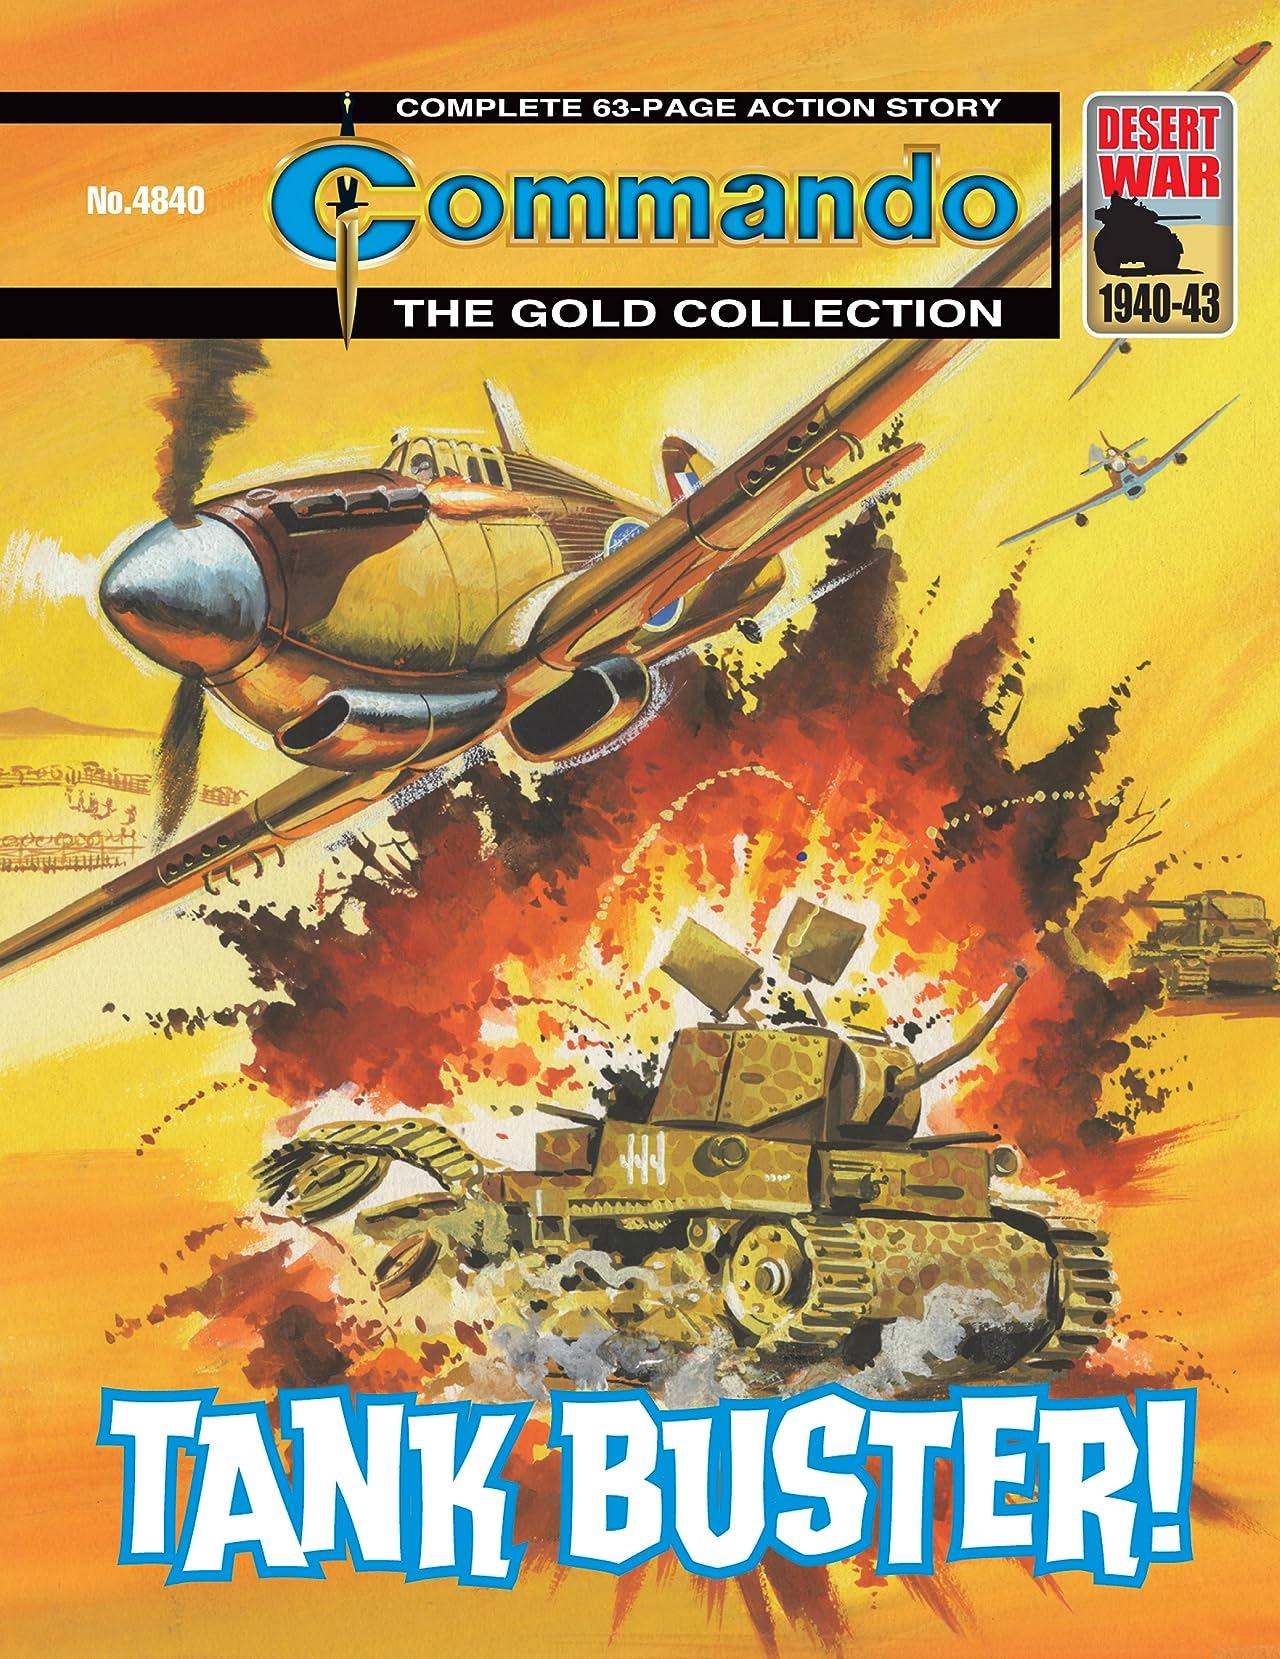 Commando #4840: Tank Buster!